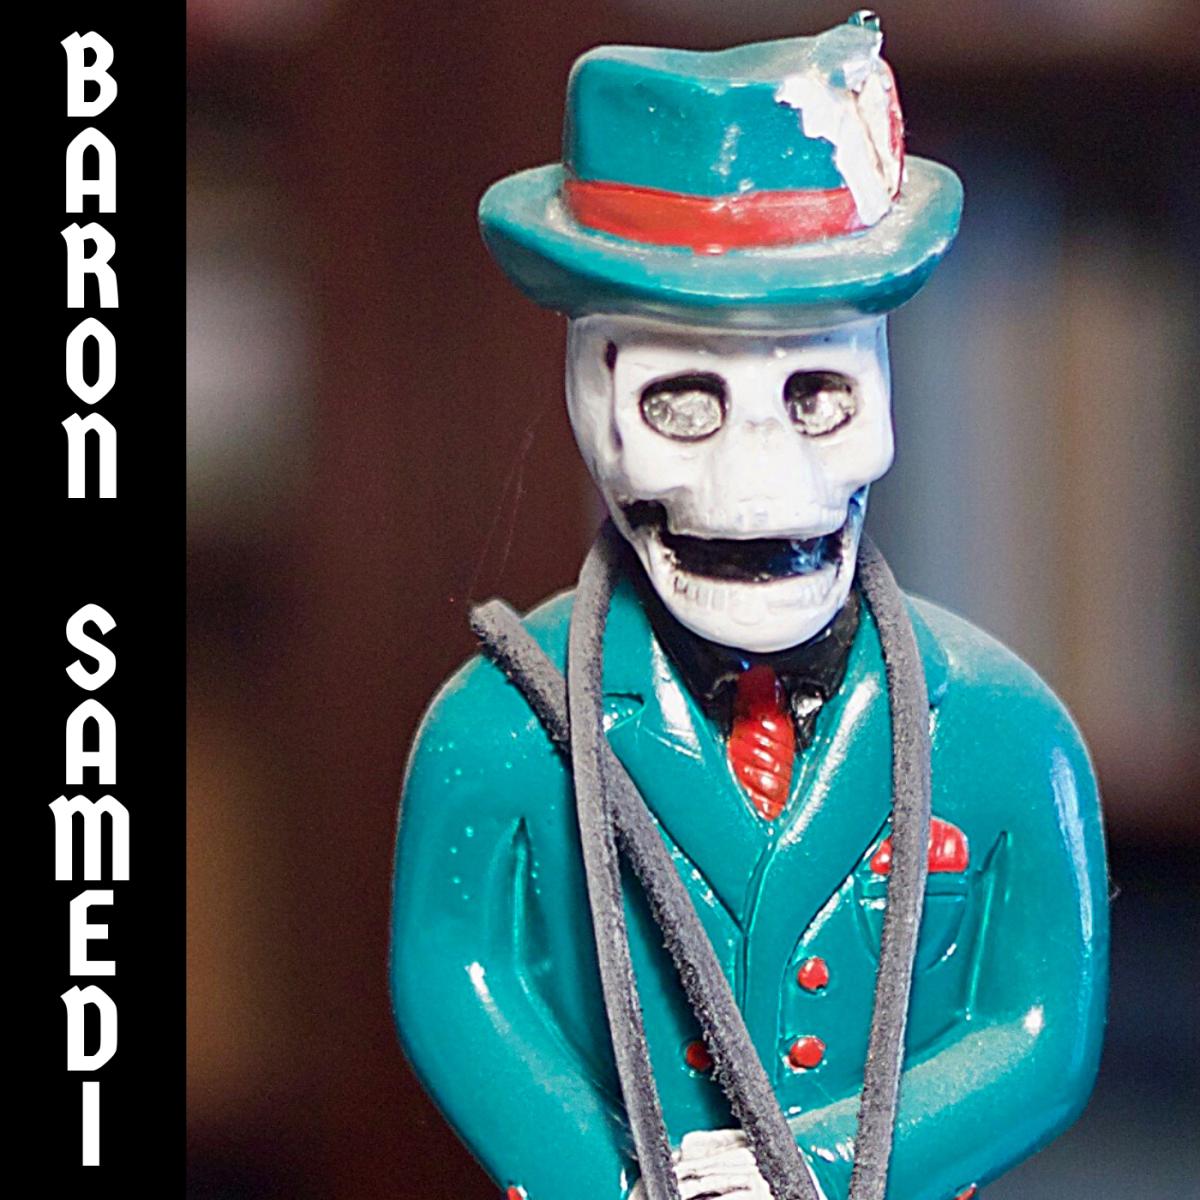 Baron Samedi's favorite pastimes include drinking, smoking, swearing, and chasing women.